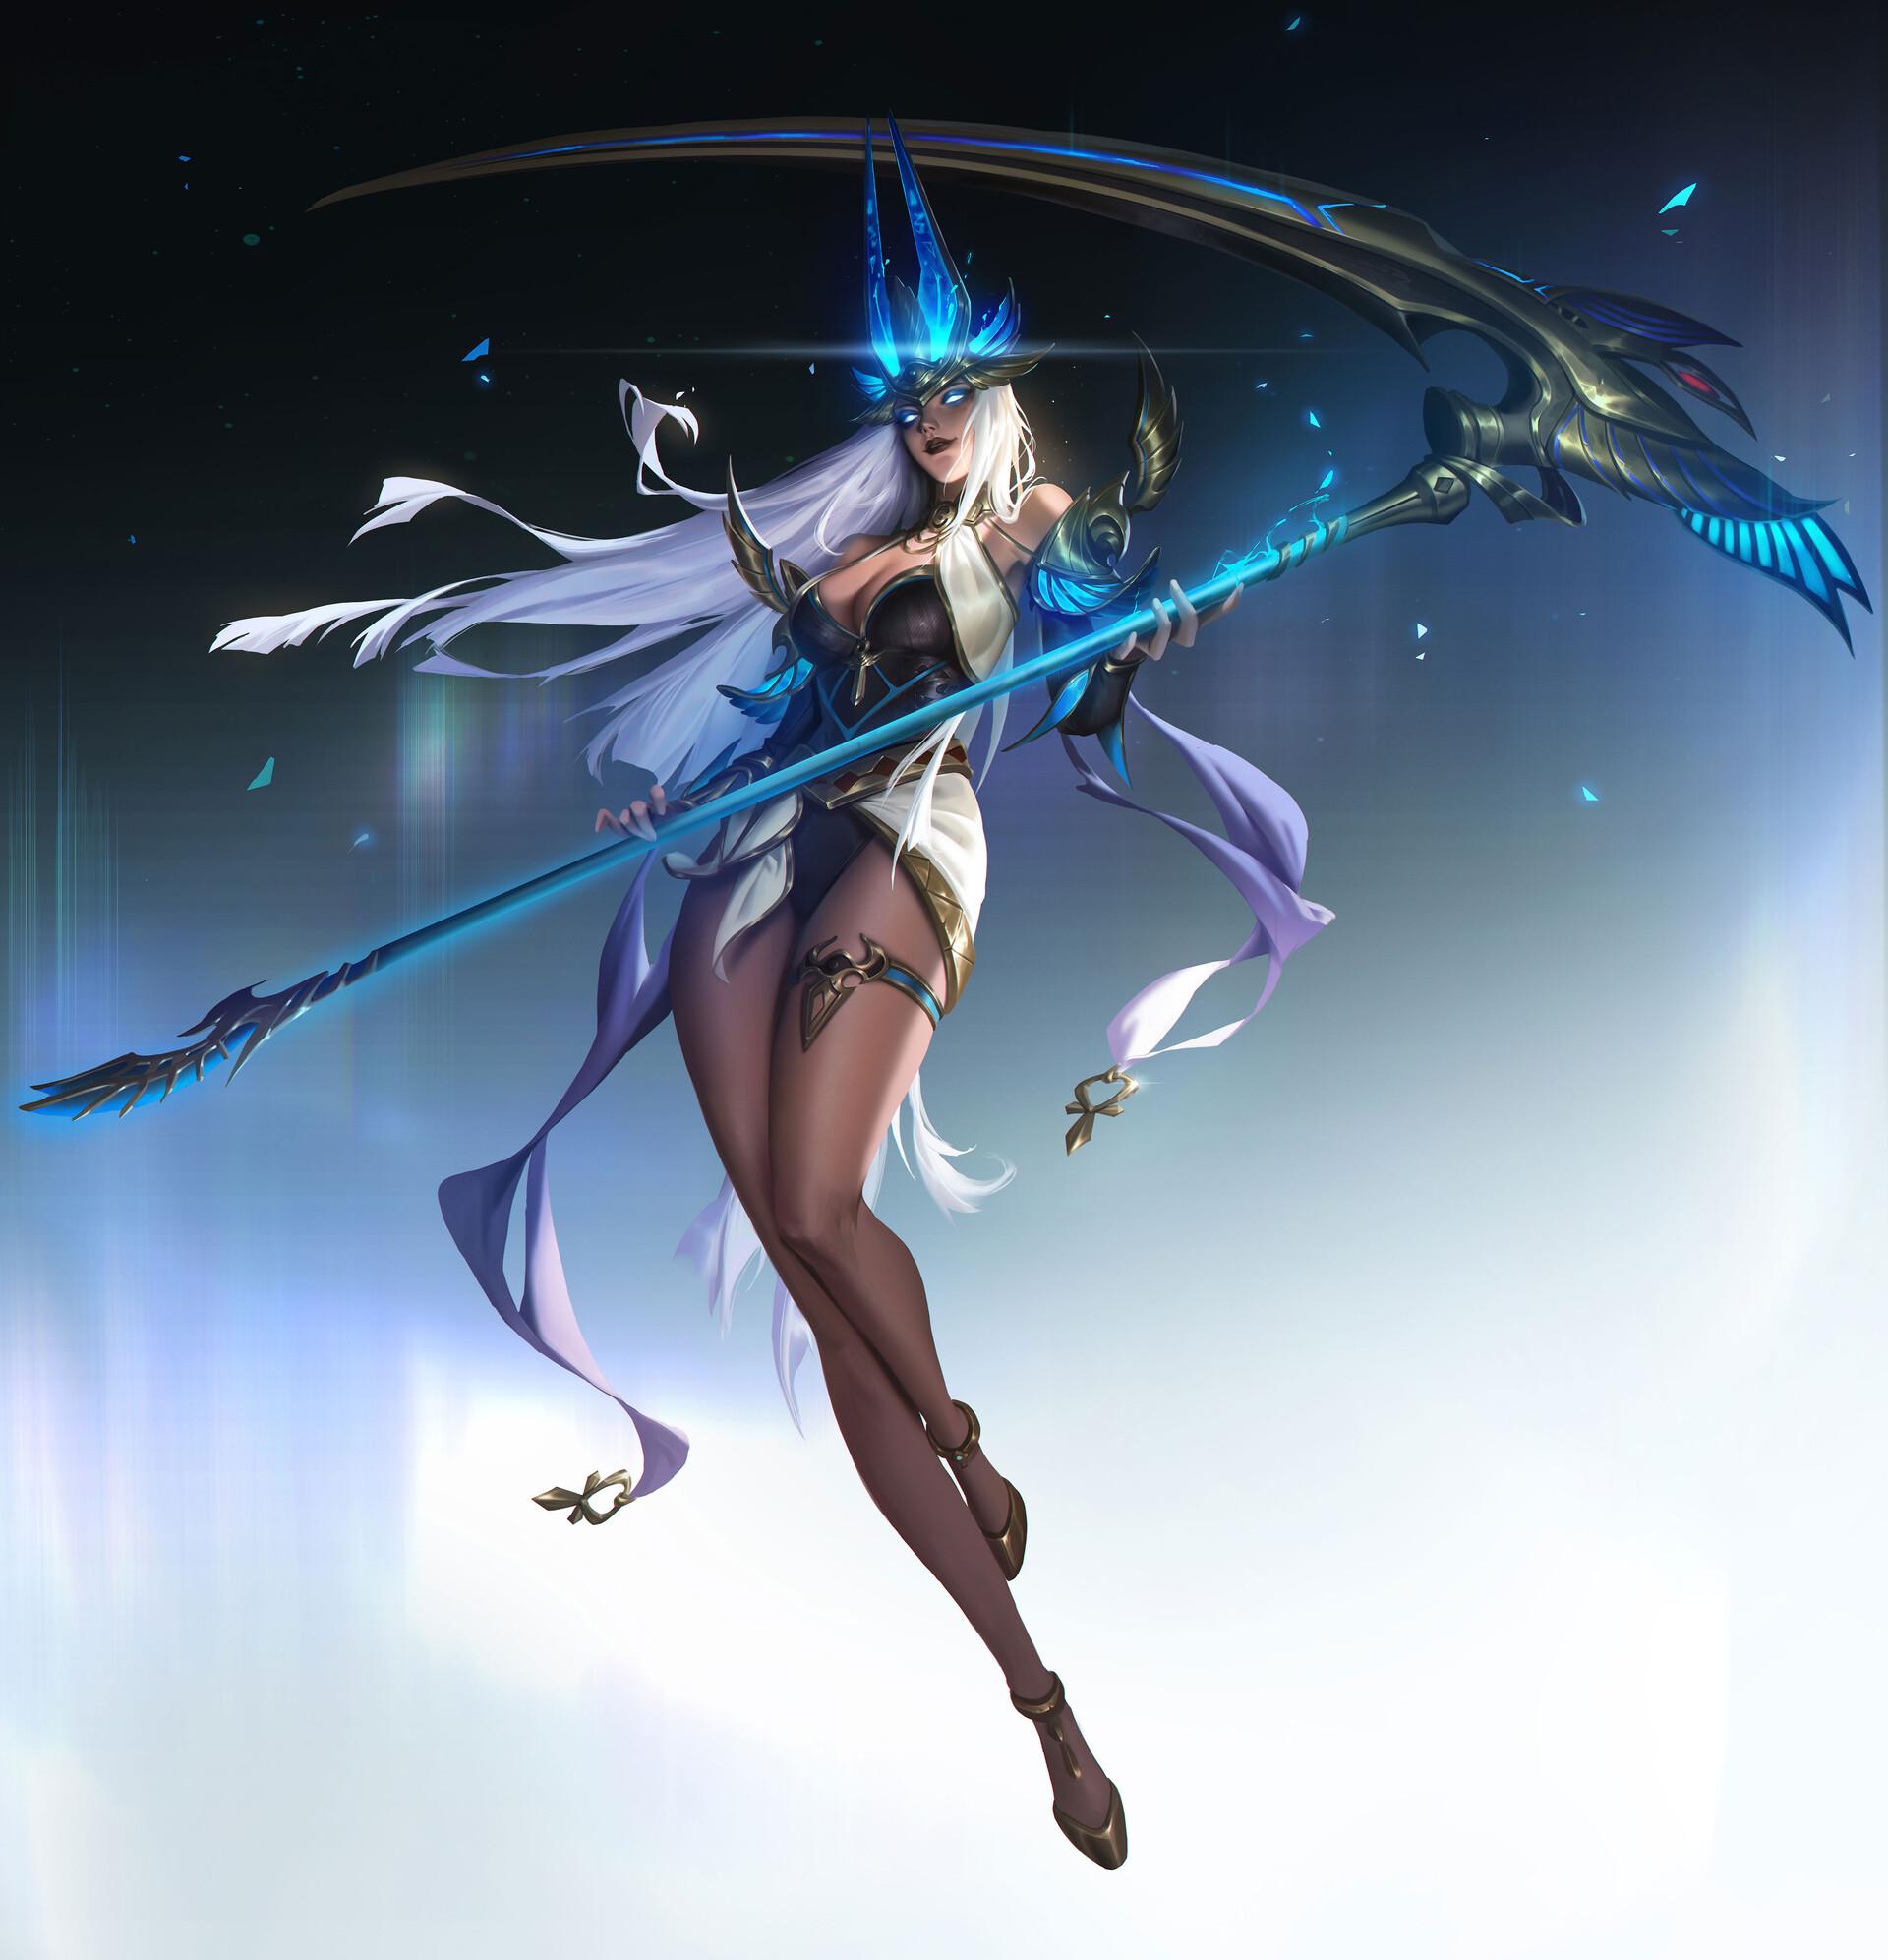 General 1920x1993 Tang 22 artwork fantasy art fantasy girl scythe women legs glowing eyes long hair legs together